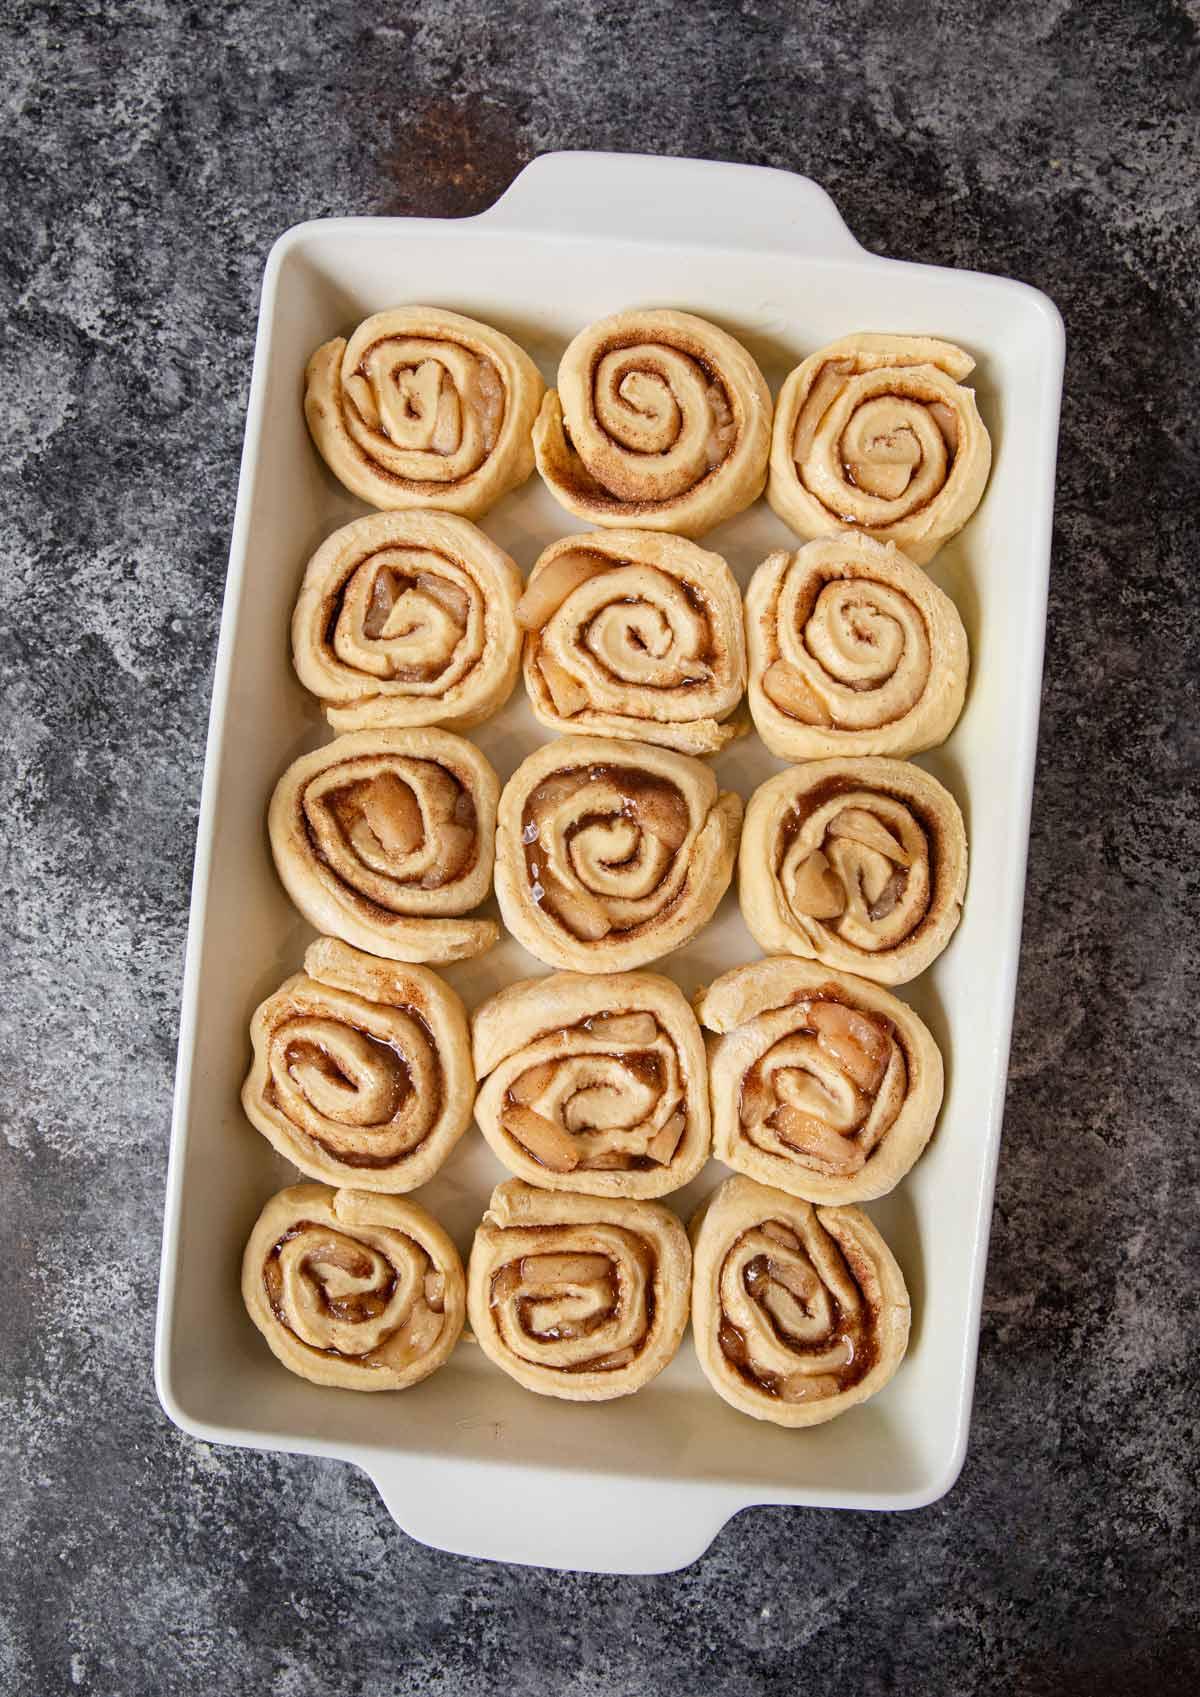 Apple Crisp Cinnamon Rolls in baking dish before proofing